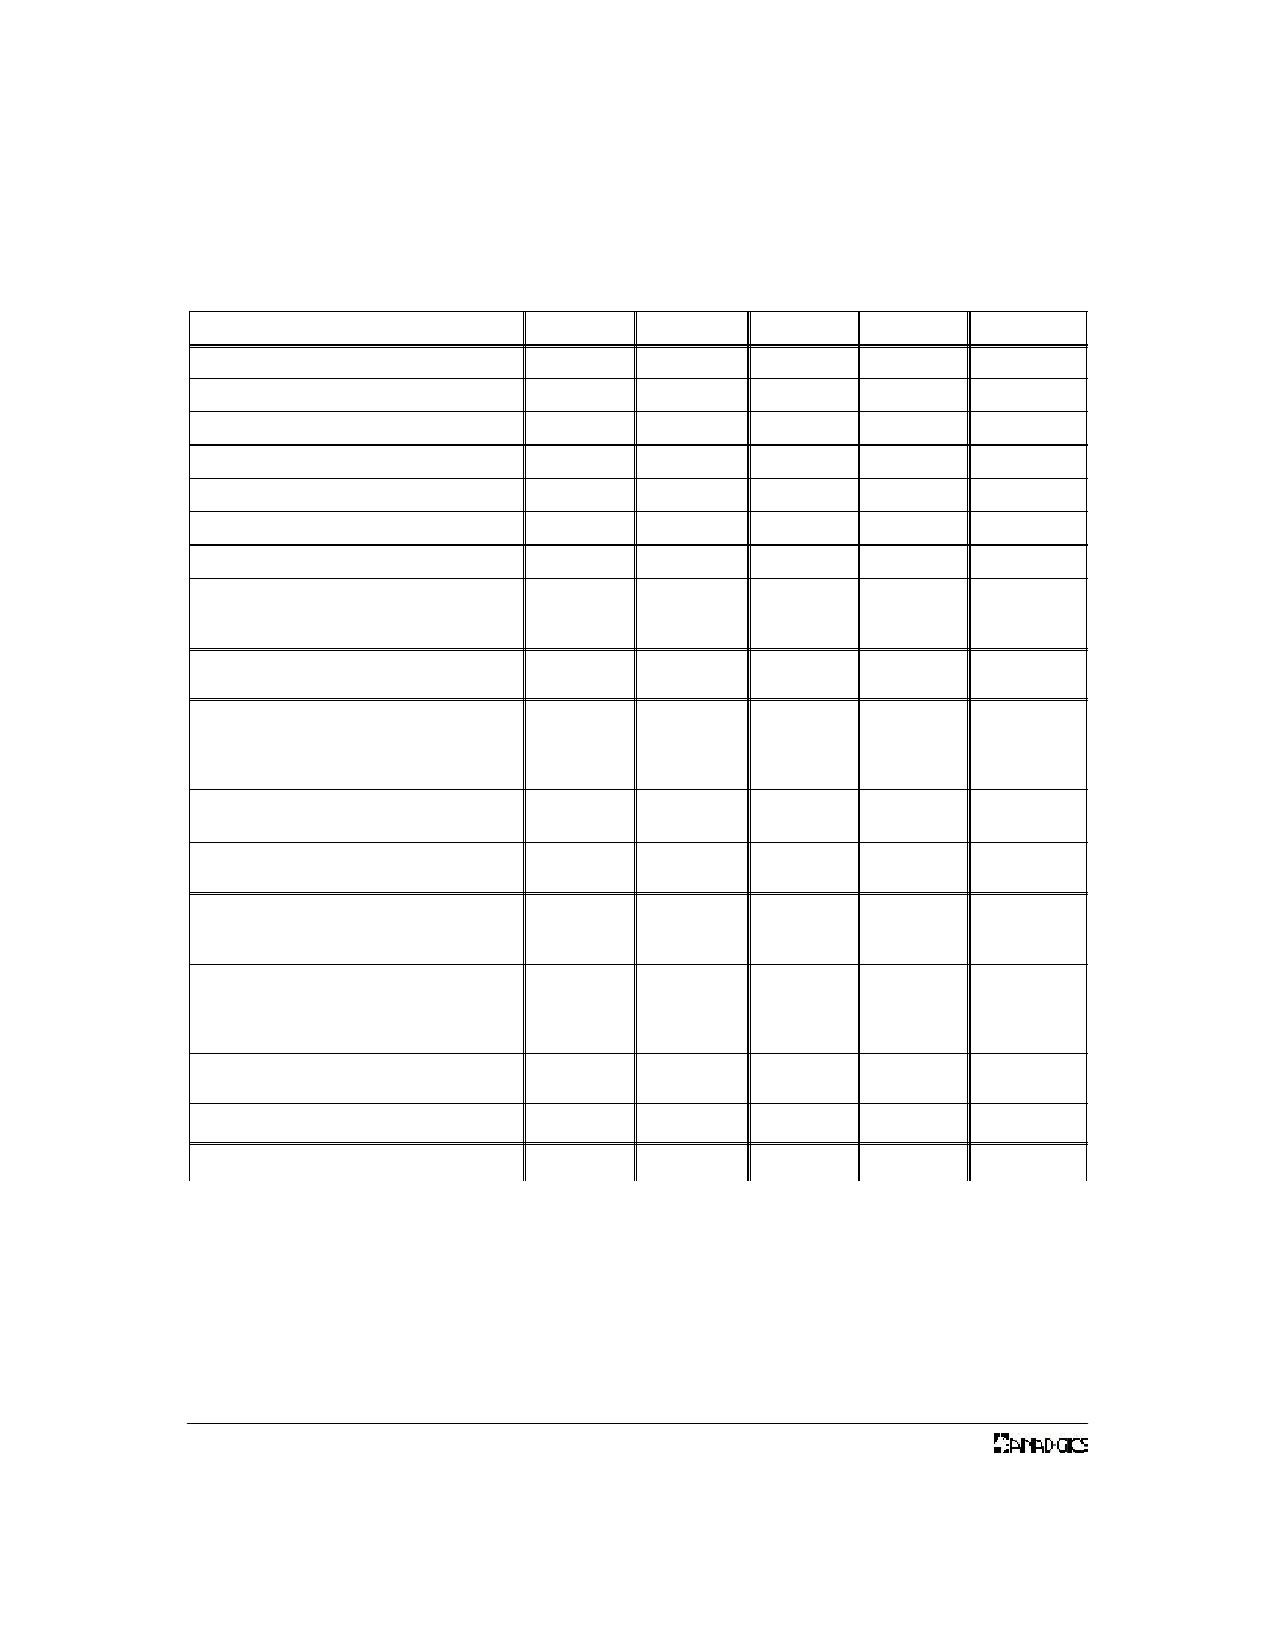 AWT6102M2 pdf, schematic